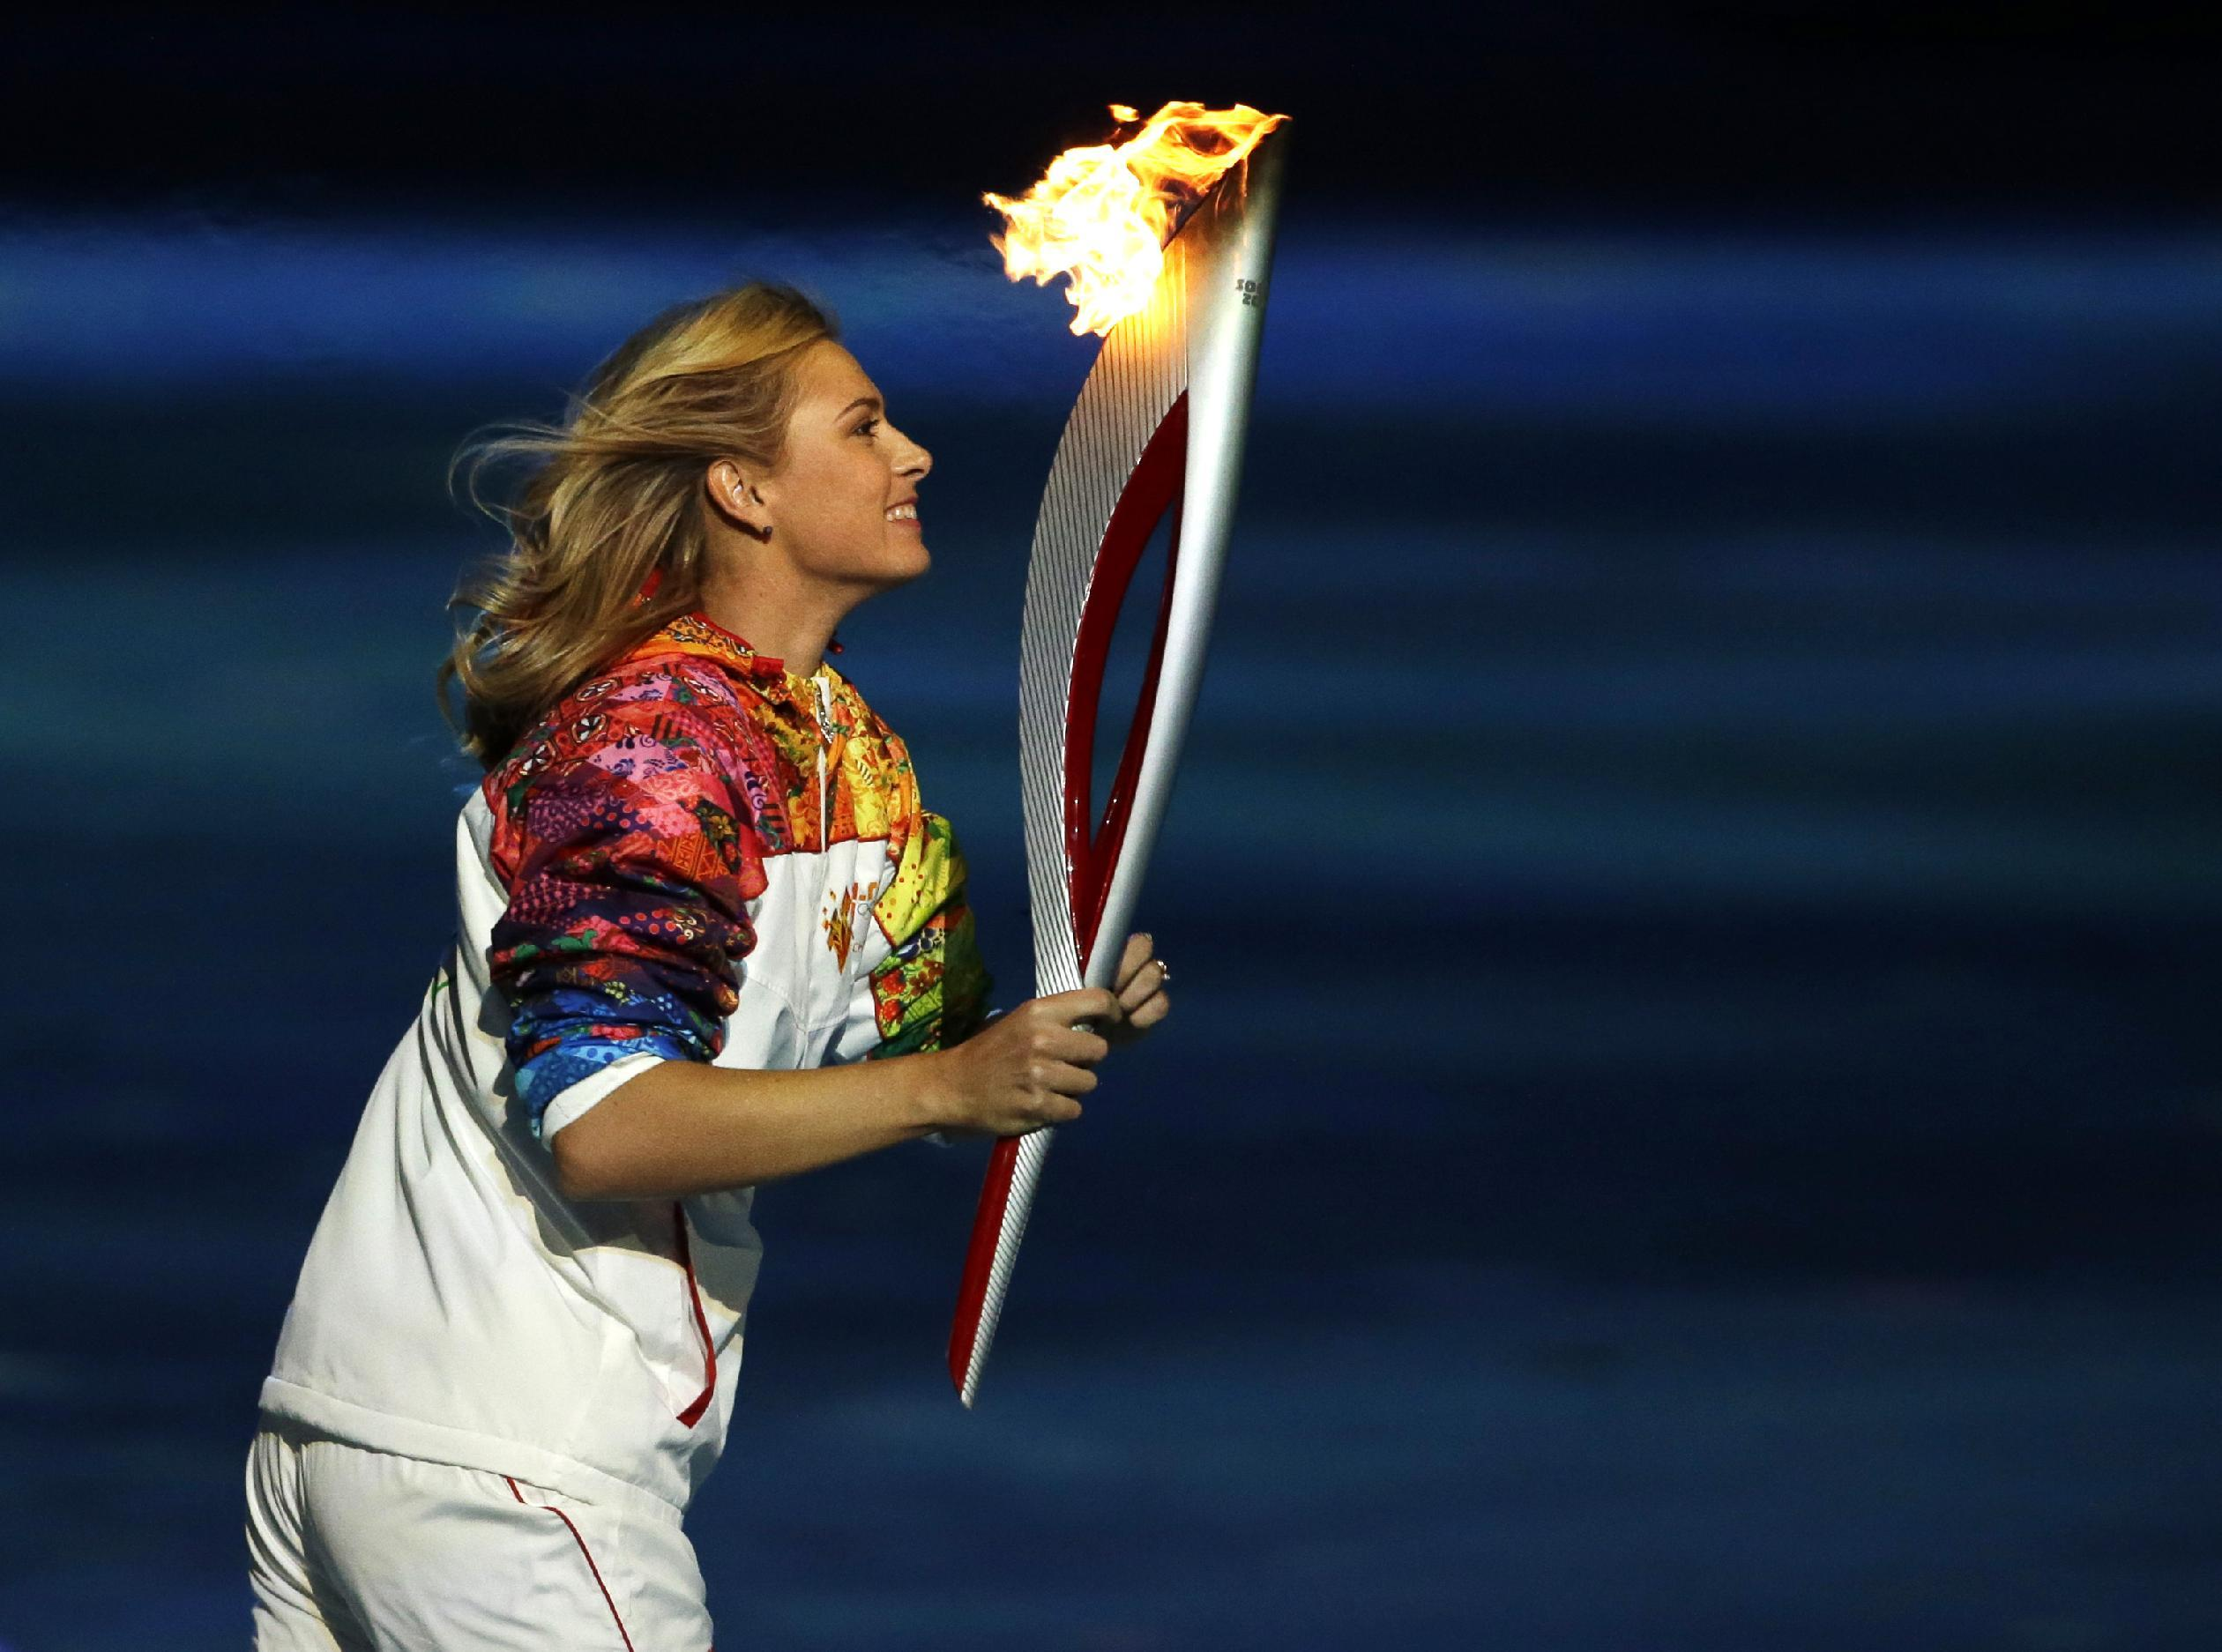 Irina Rodnina and Vladislav Tretyak lit the Olympic flame in Sochi 70